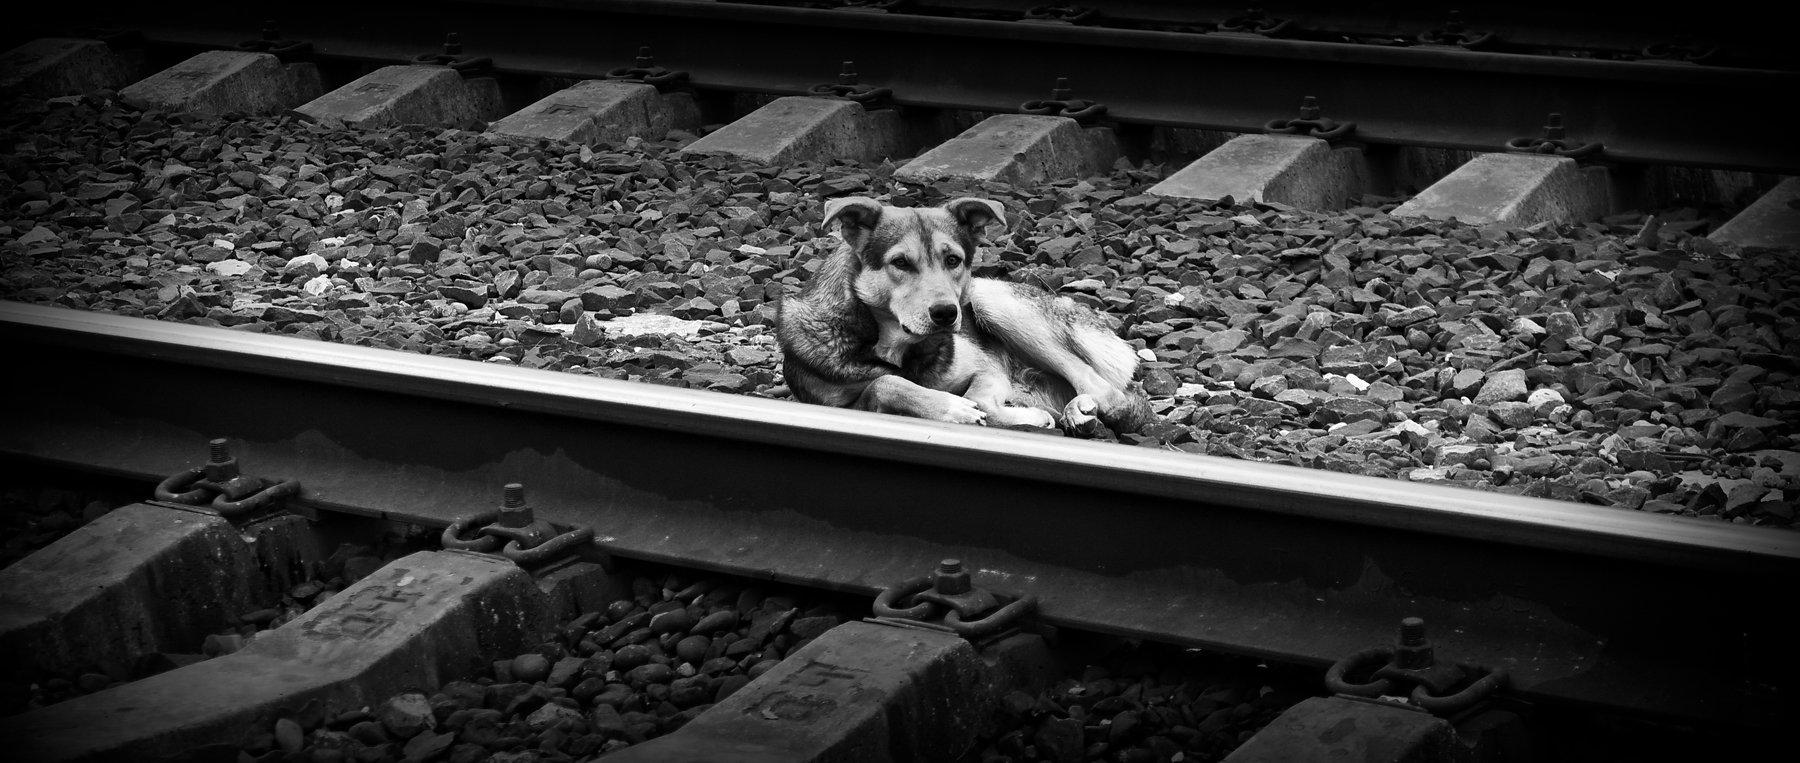 собака, пёс, животное, грусть, одиночка, собаки, Vladimir Kedrov